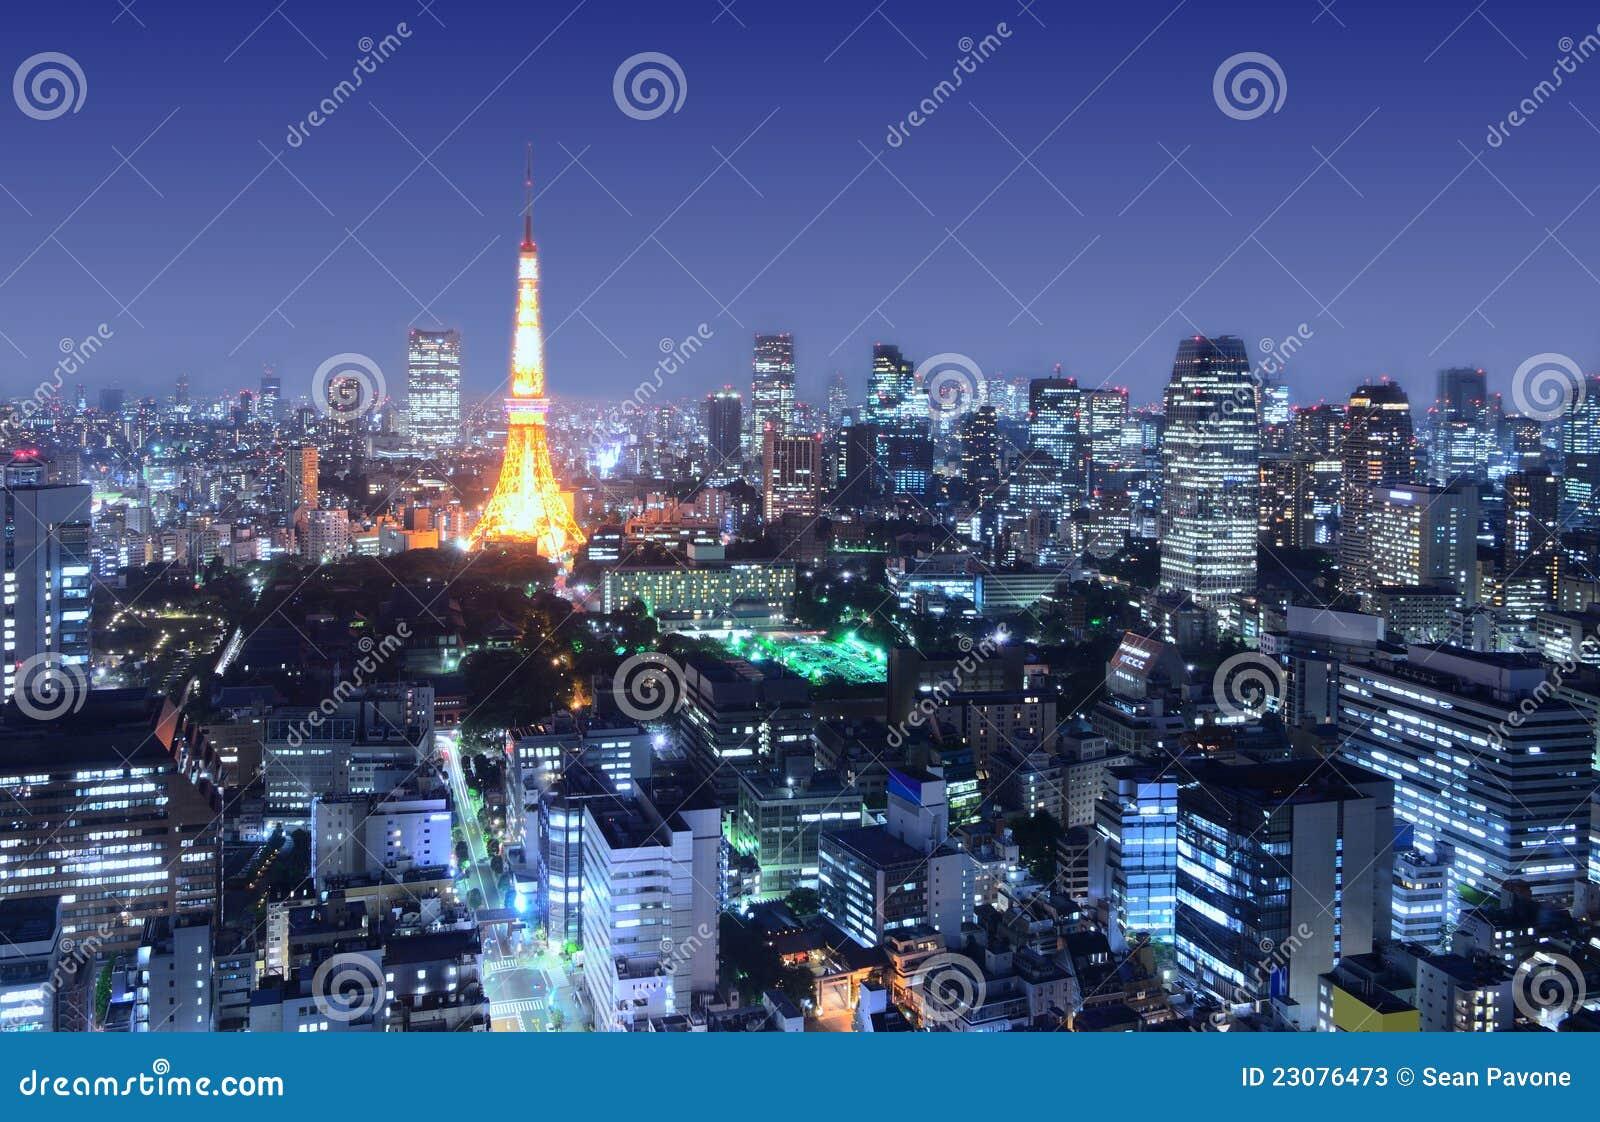 Tokyo Tower Stands Amongst The Minato-ku Cityscape Stock Photos - Image: 2307...